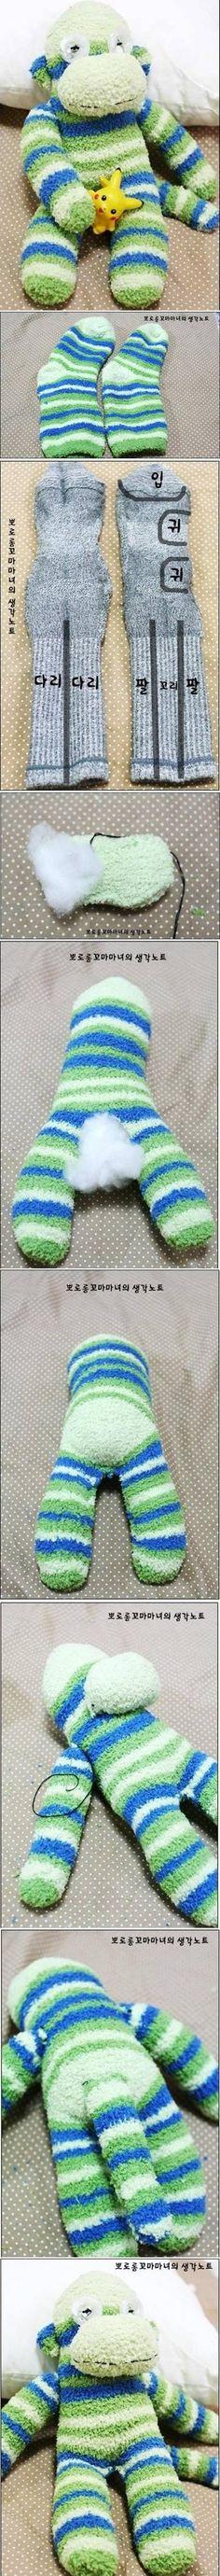 DIY носки обезьяны Терри DIY носки обезьяны Терри